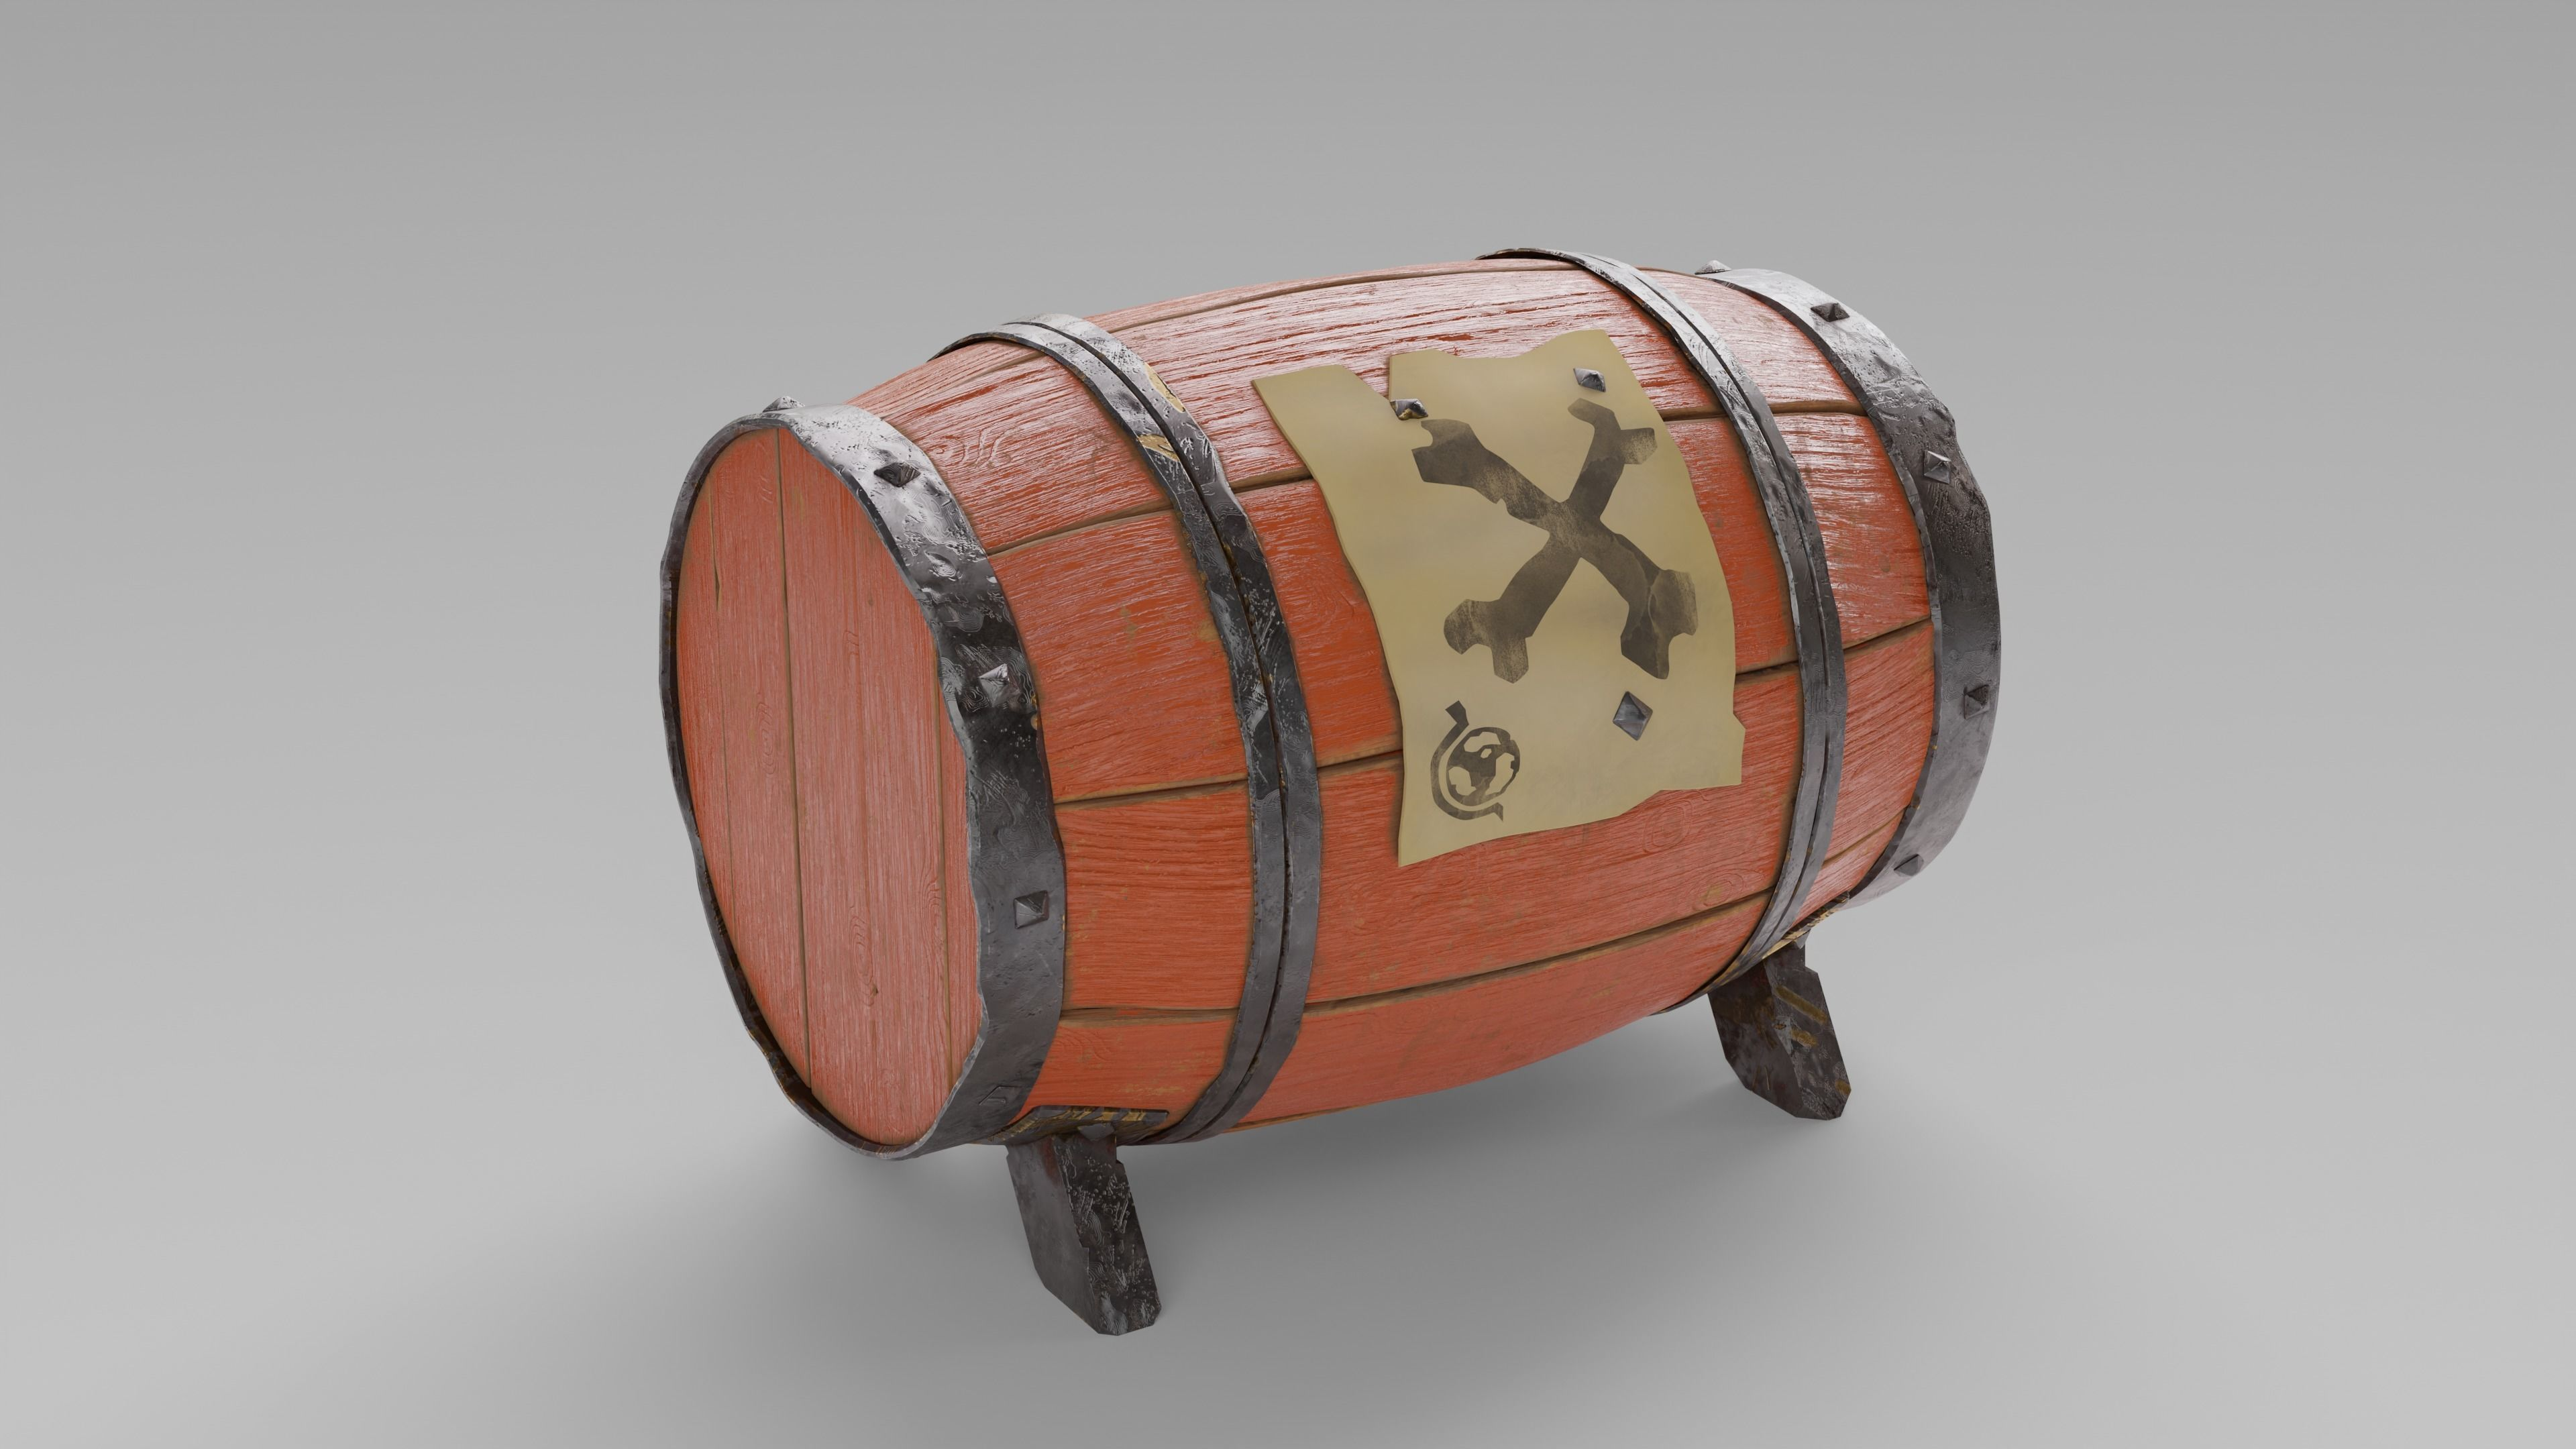 Gunpowder Barrel - The Sea of Thieves